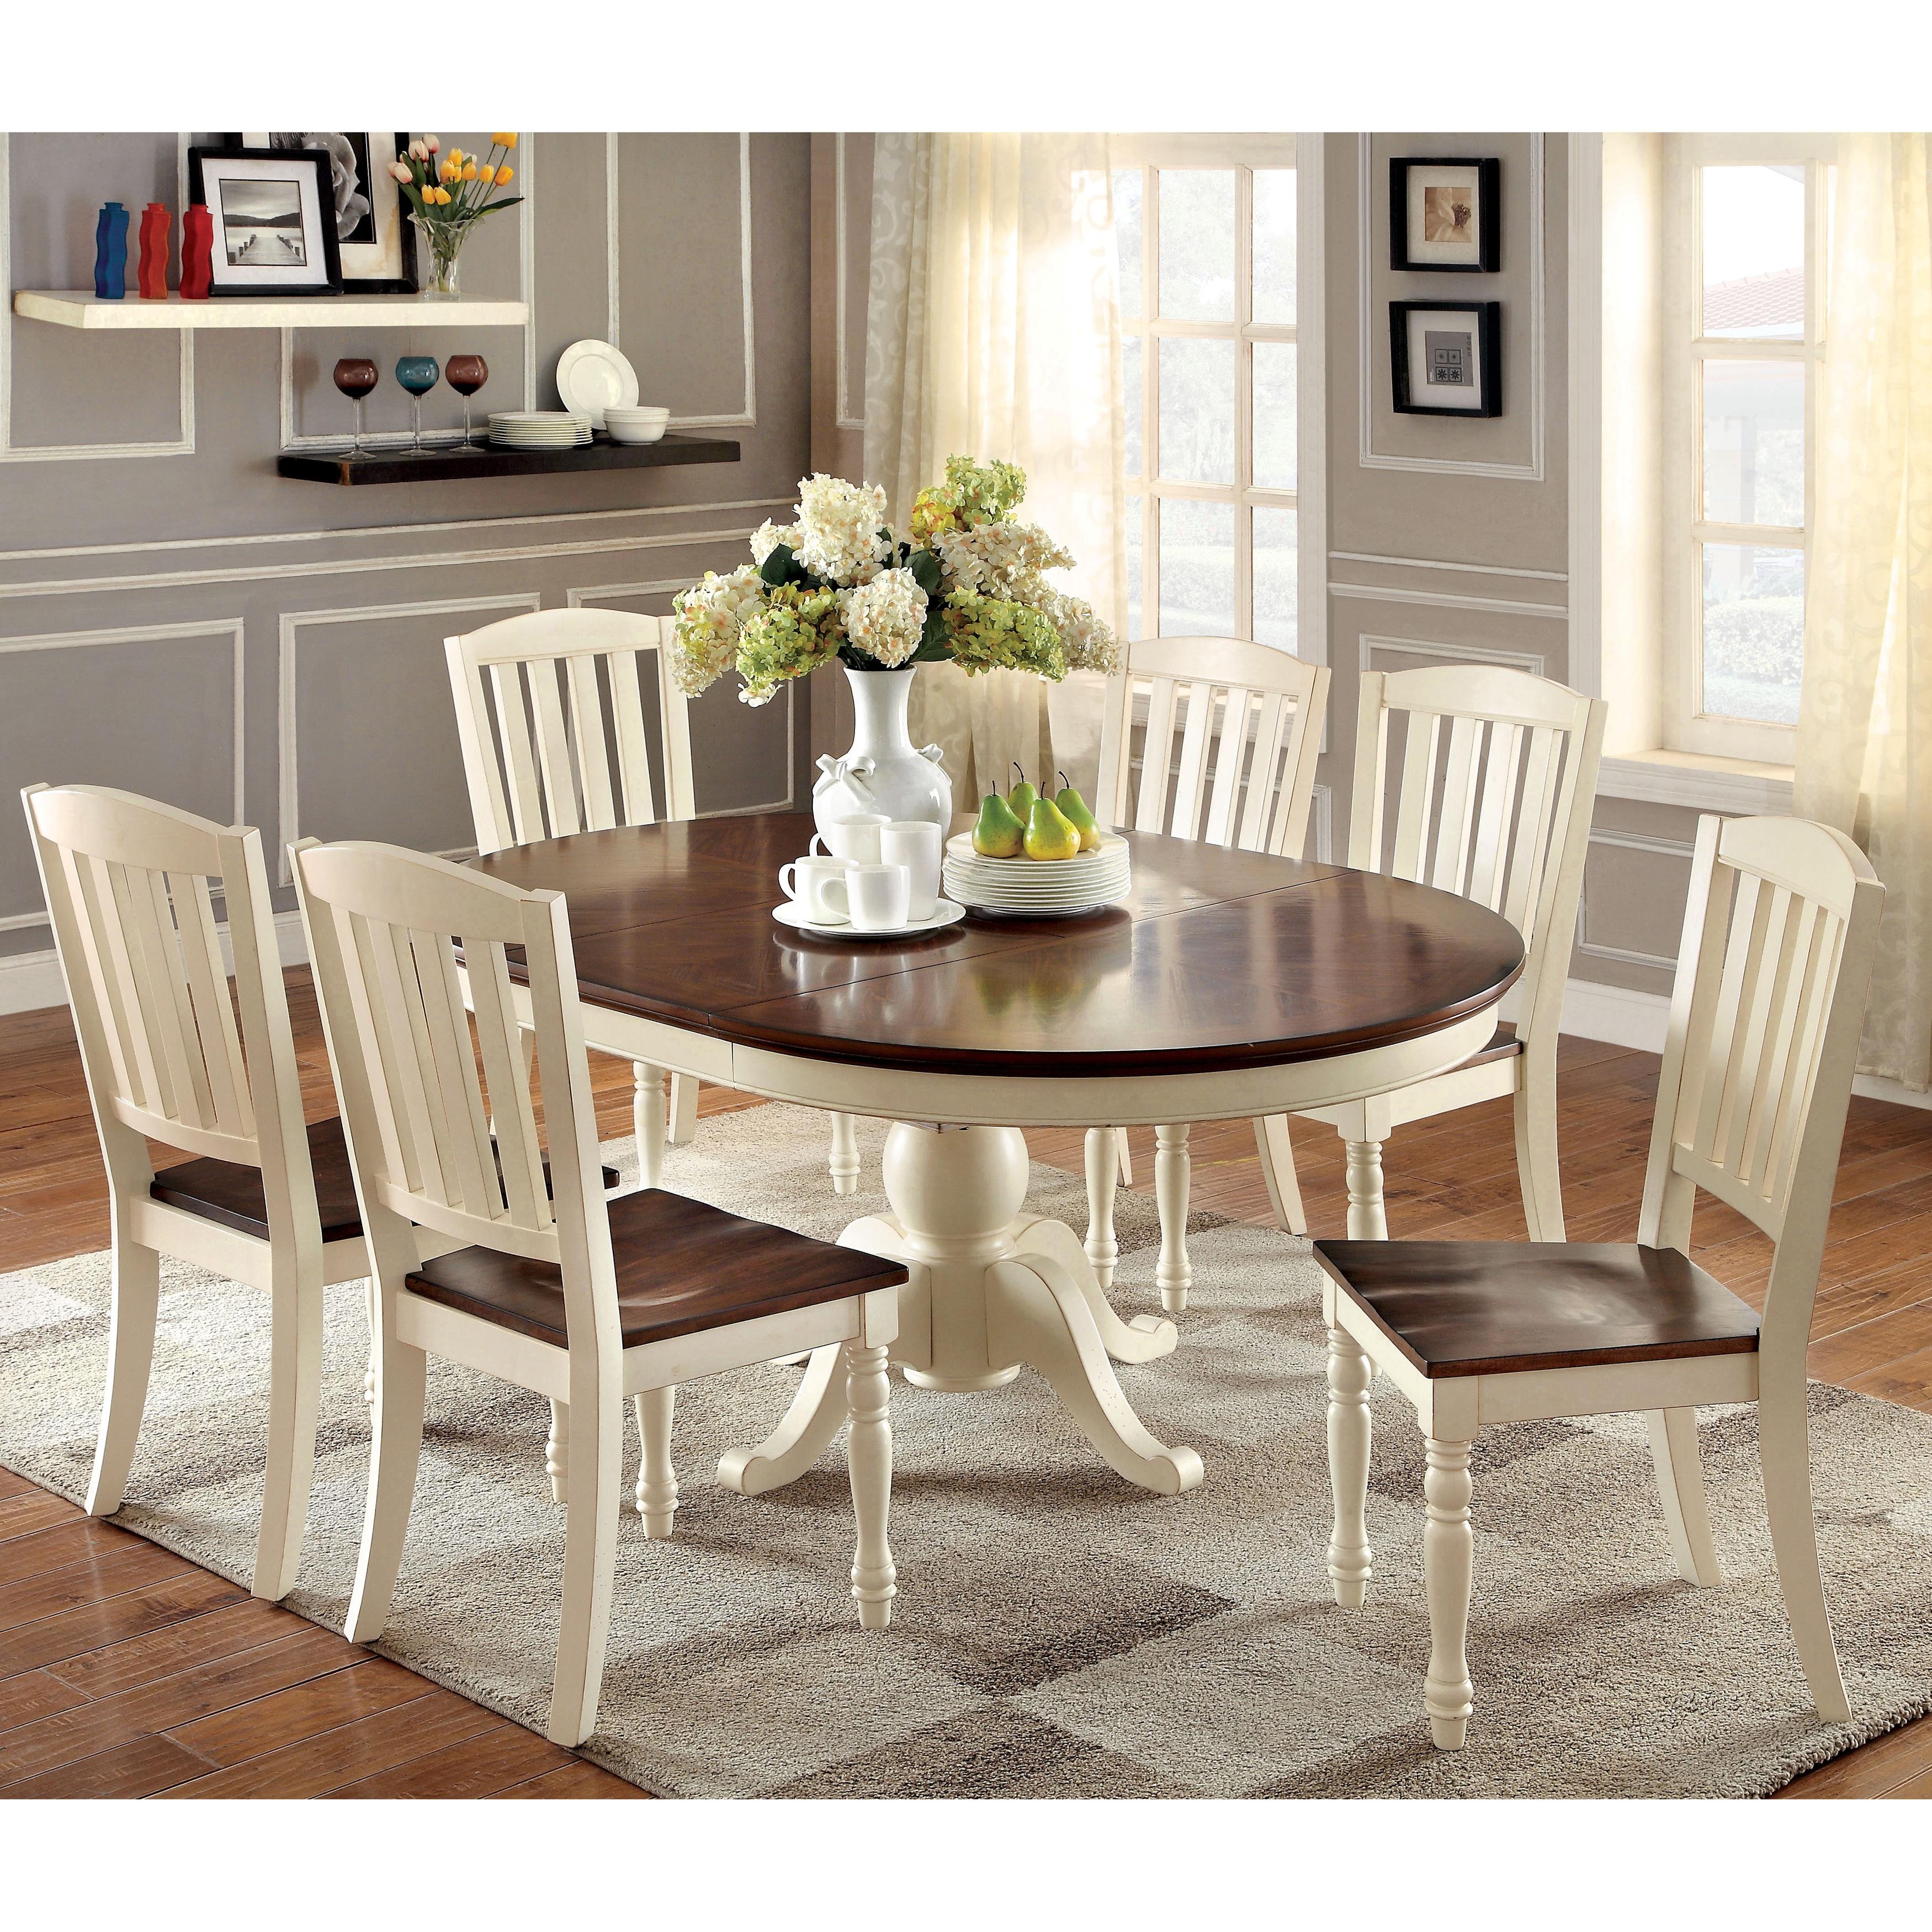 shop the gray barn pitchfork 7 piece cottage style oval dining set